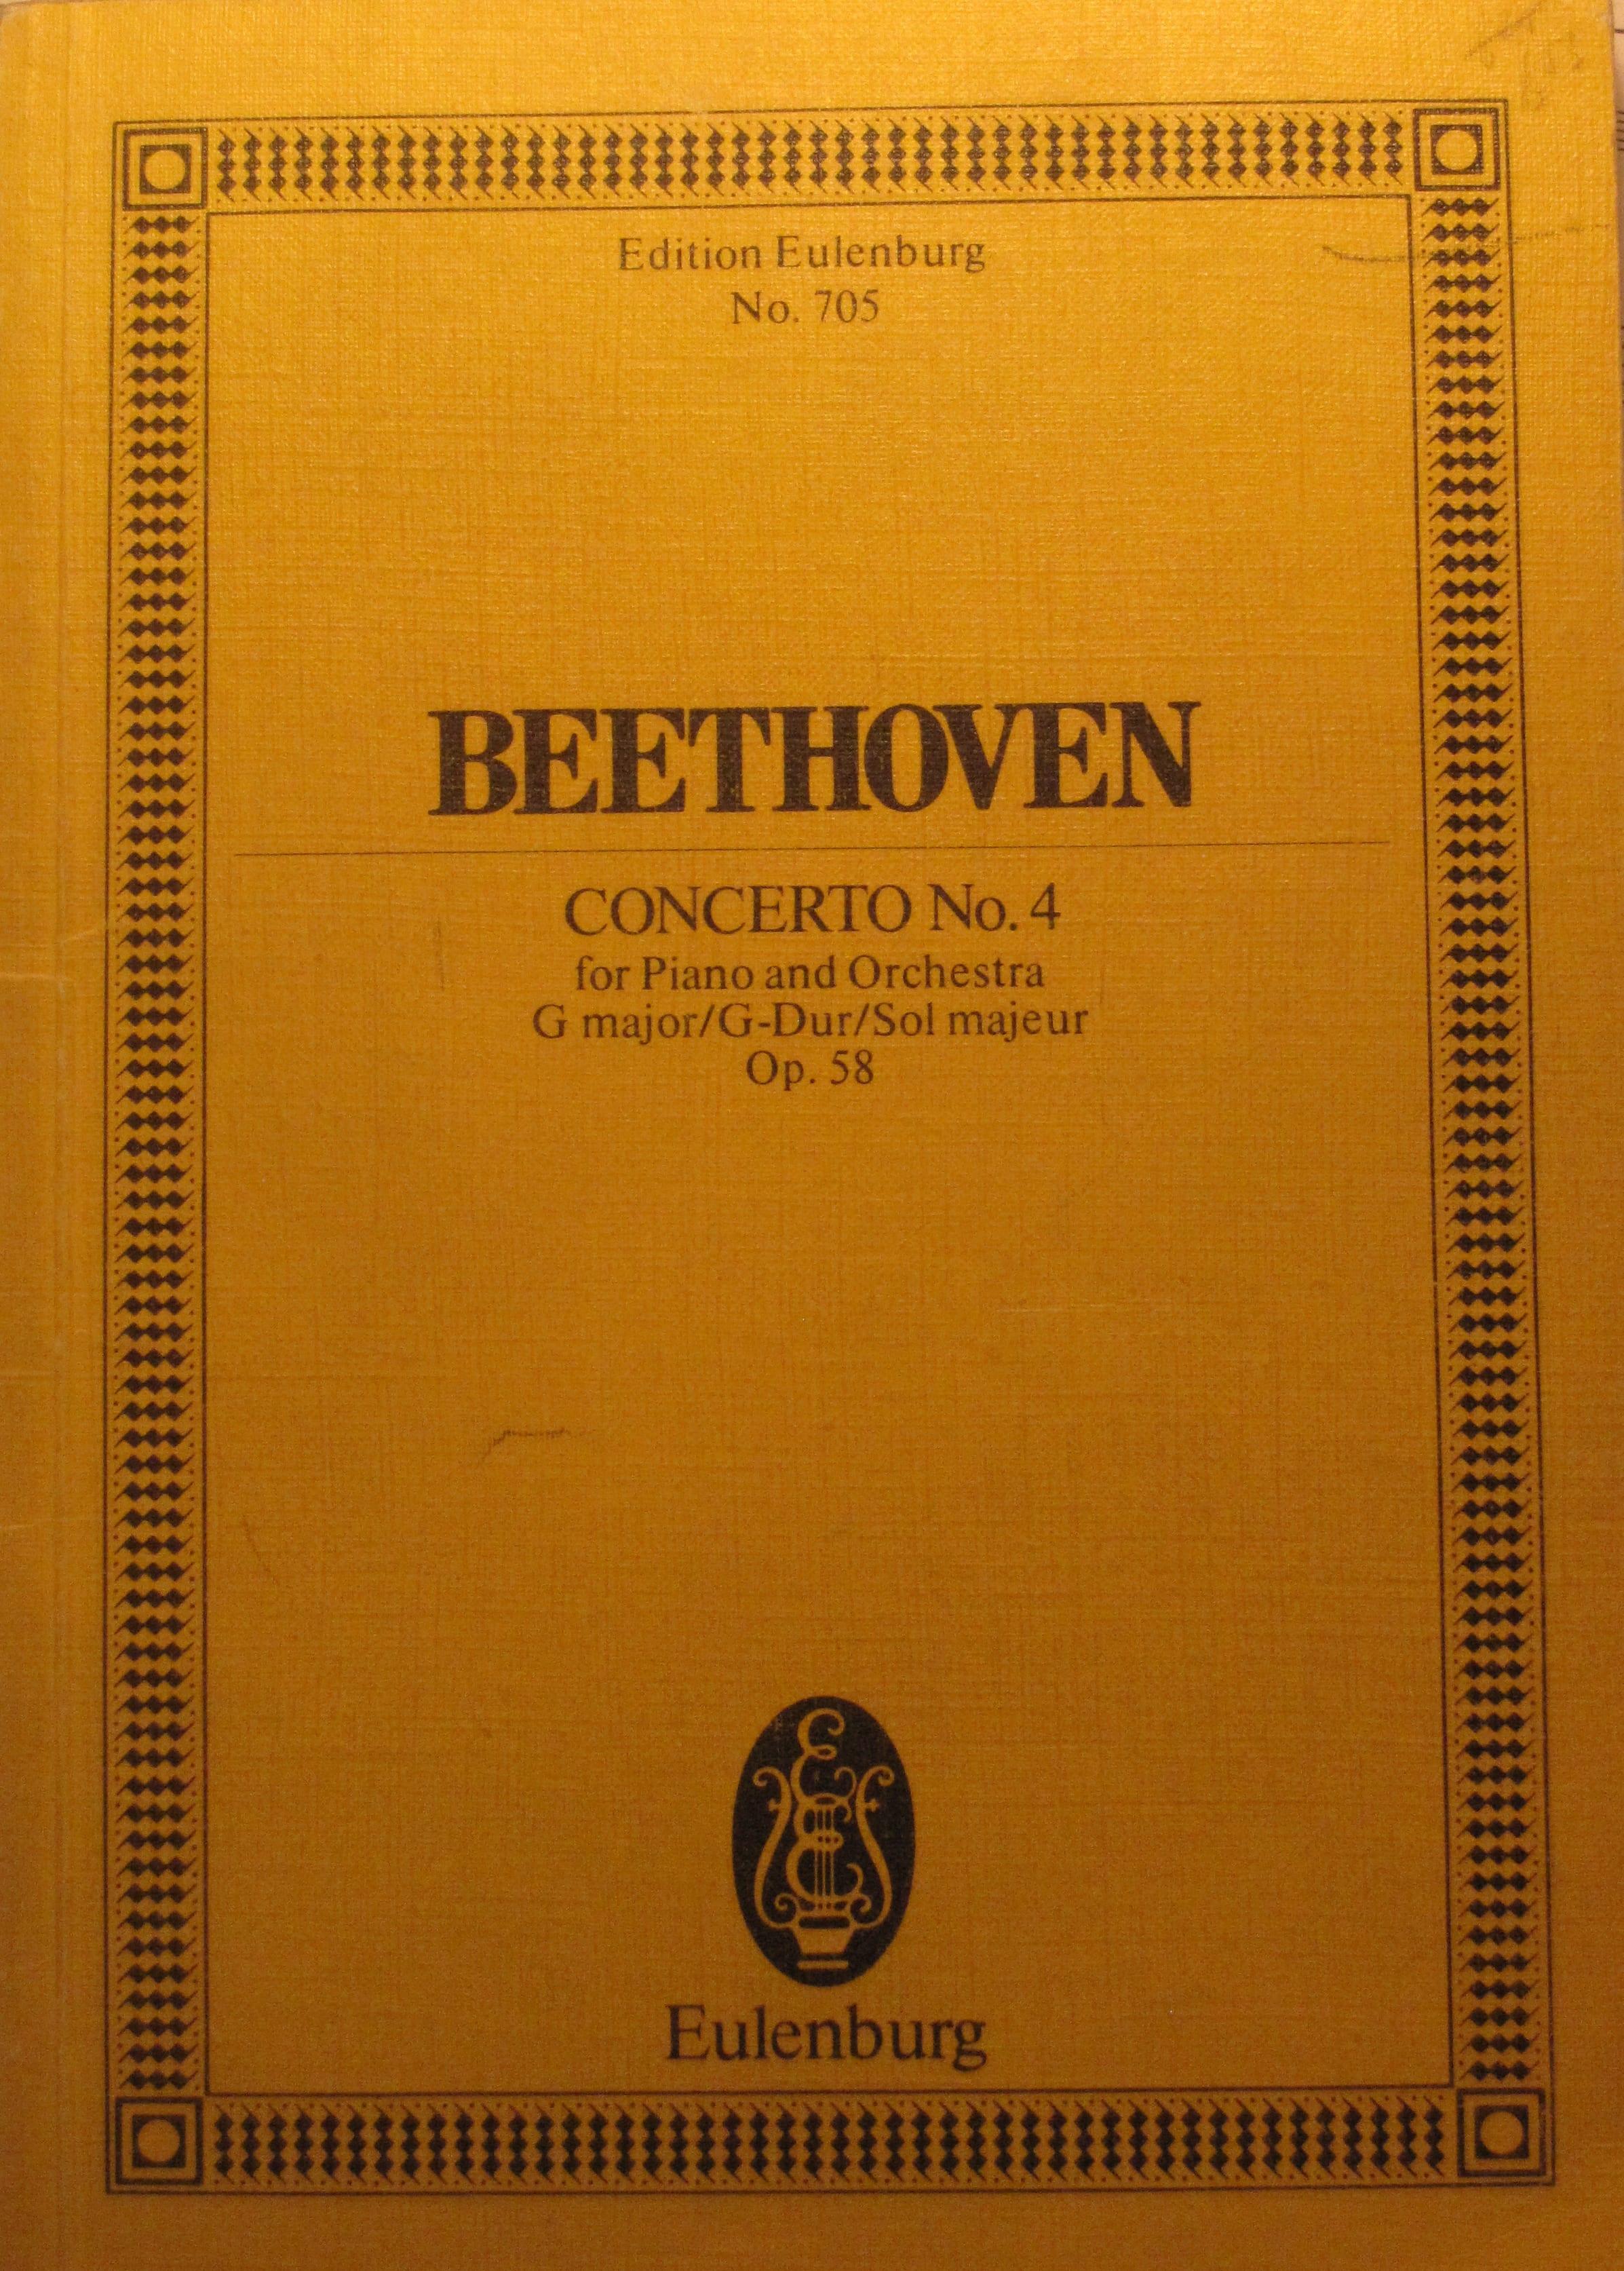 Beethoven : Klavier-konzert G Dur . Sol Majeur pauer G Major Opus 58.